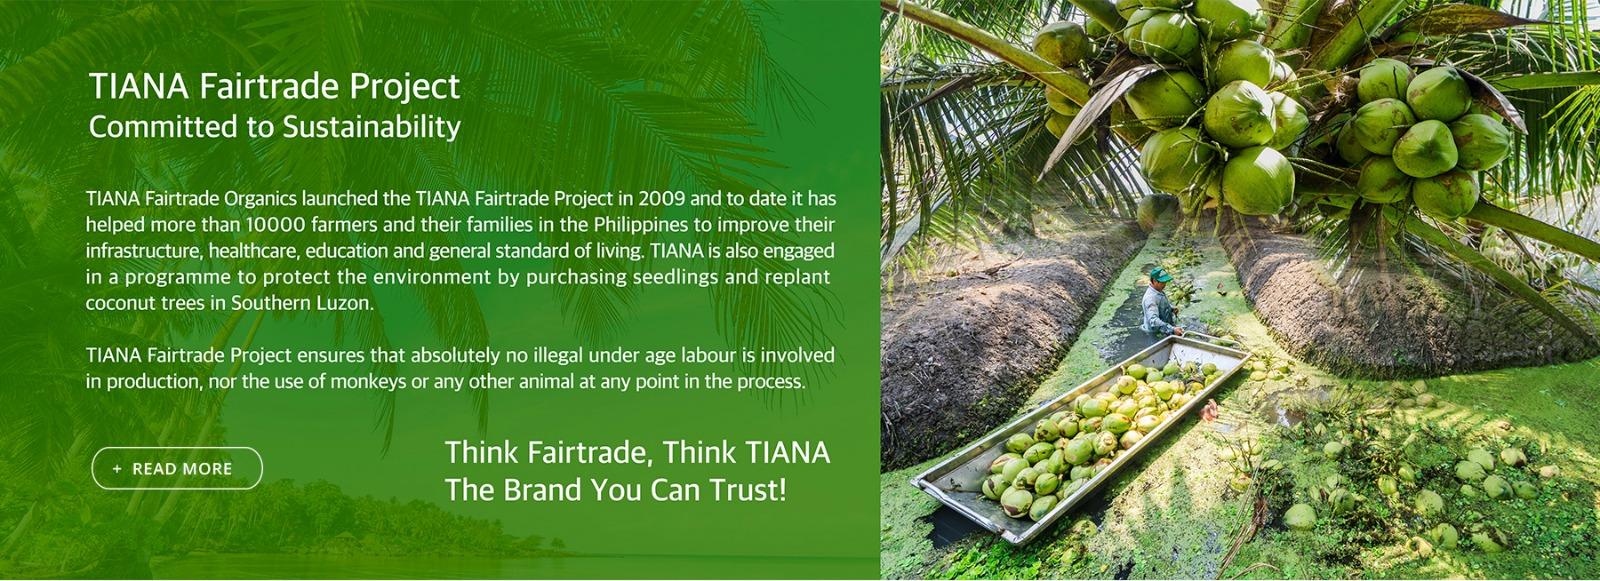 tiana fairtrade organics